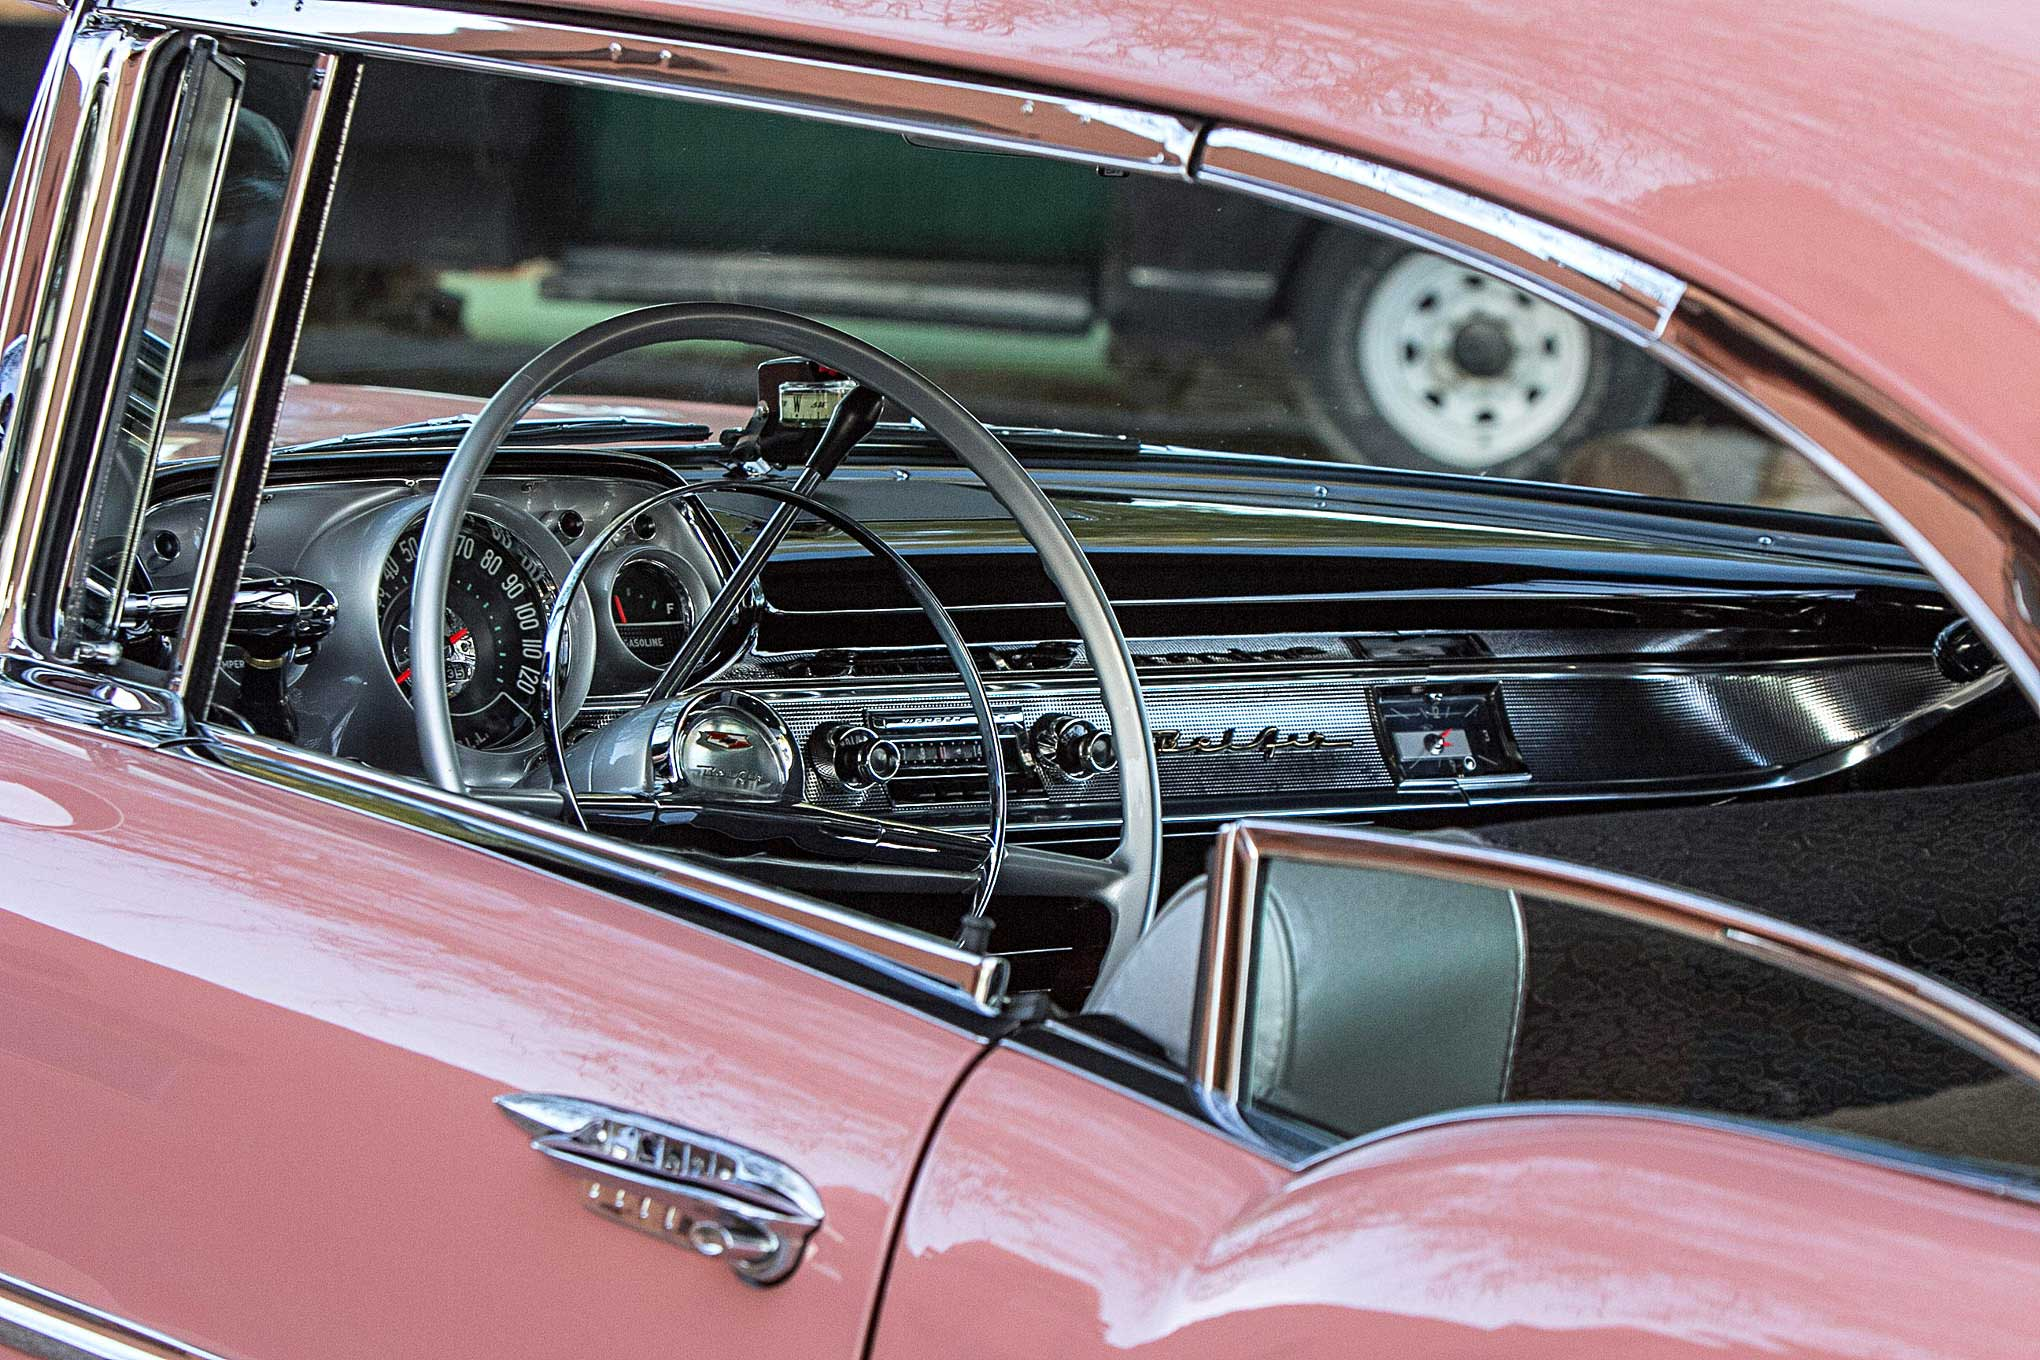 1957 Chevrolet Bel Air Interior Lowrider